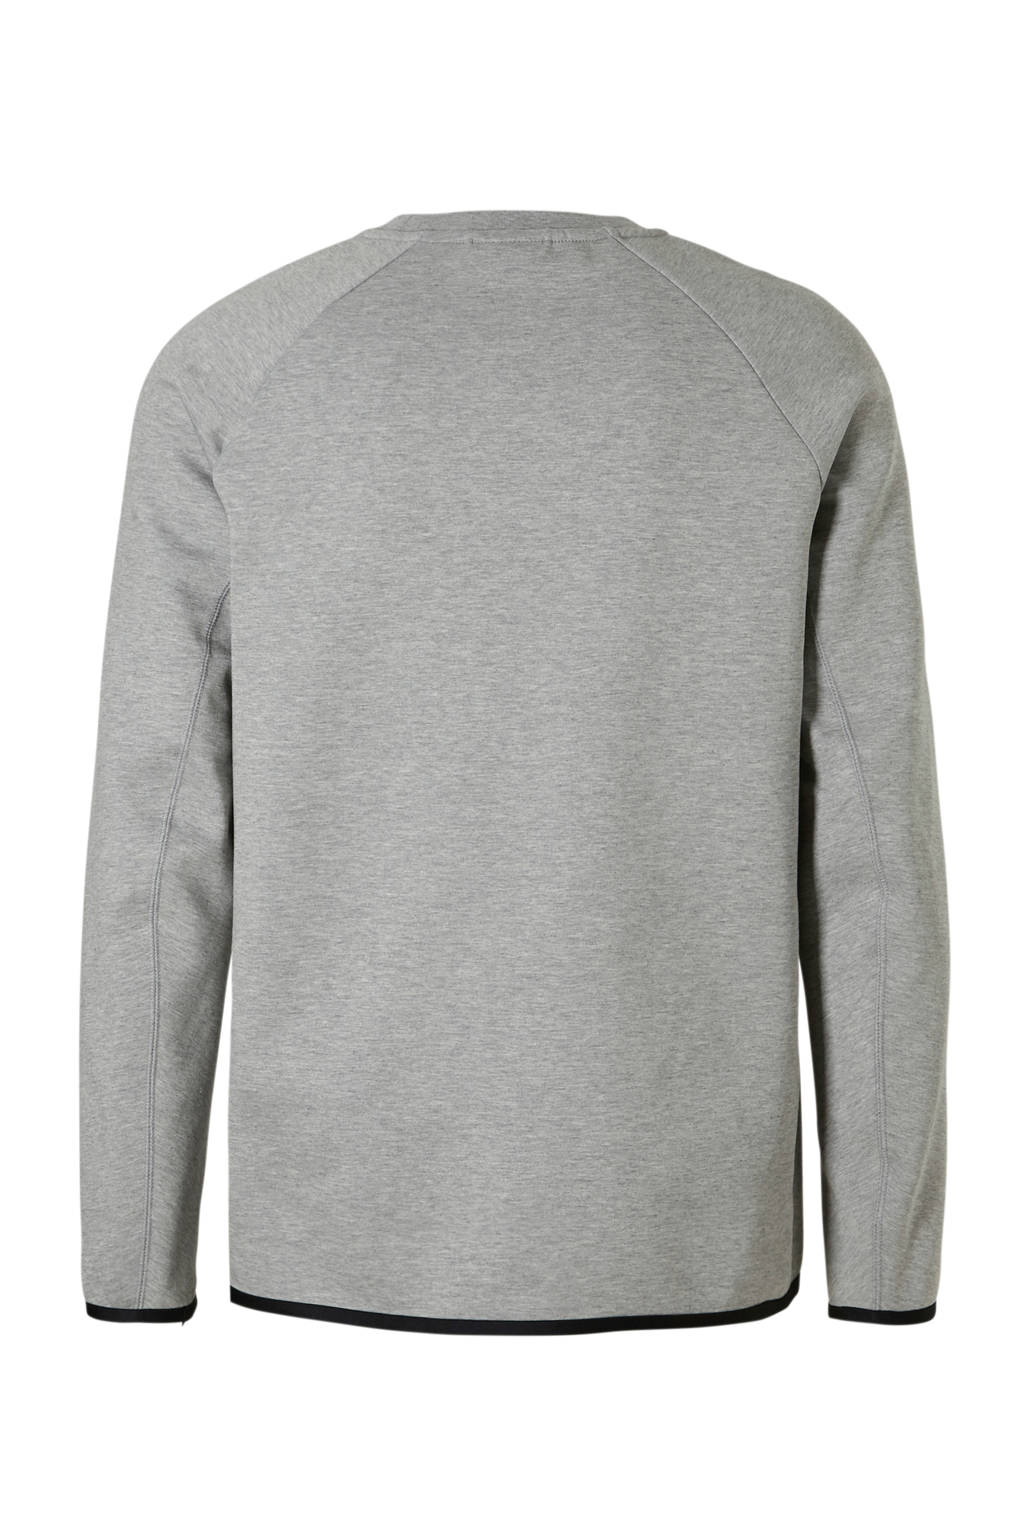 5c4cca09f1d Nike sweater grijs melange, Grijs melange